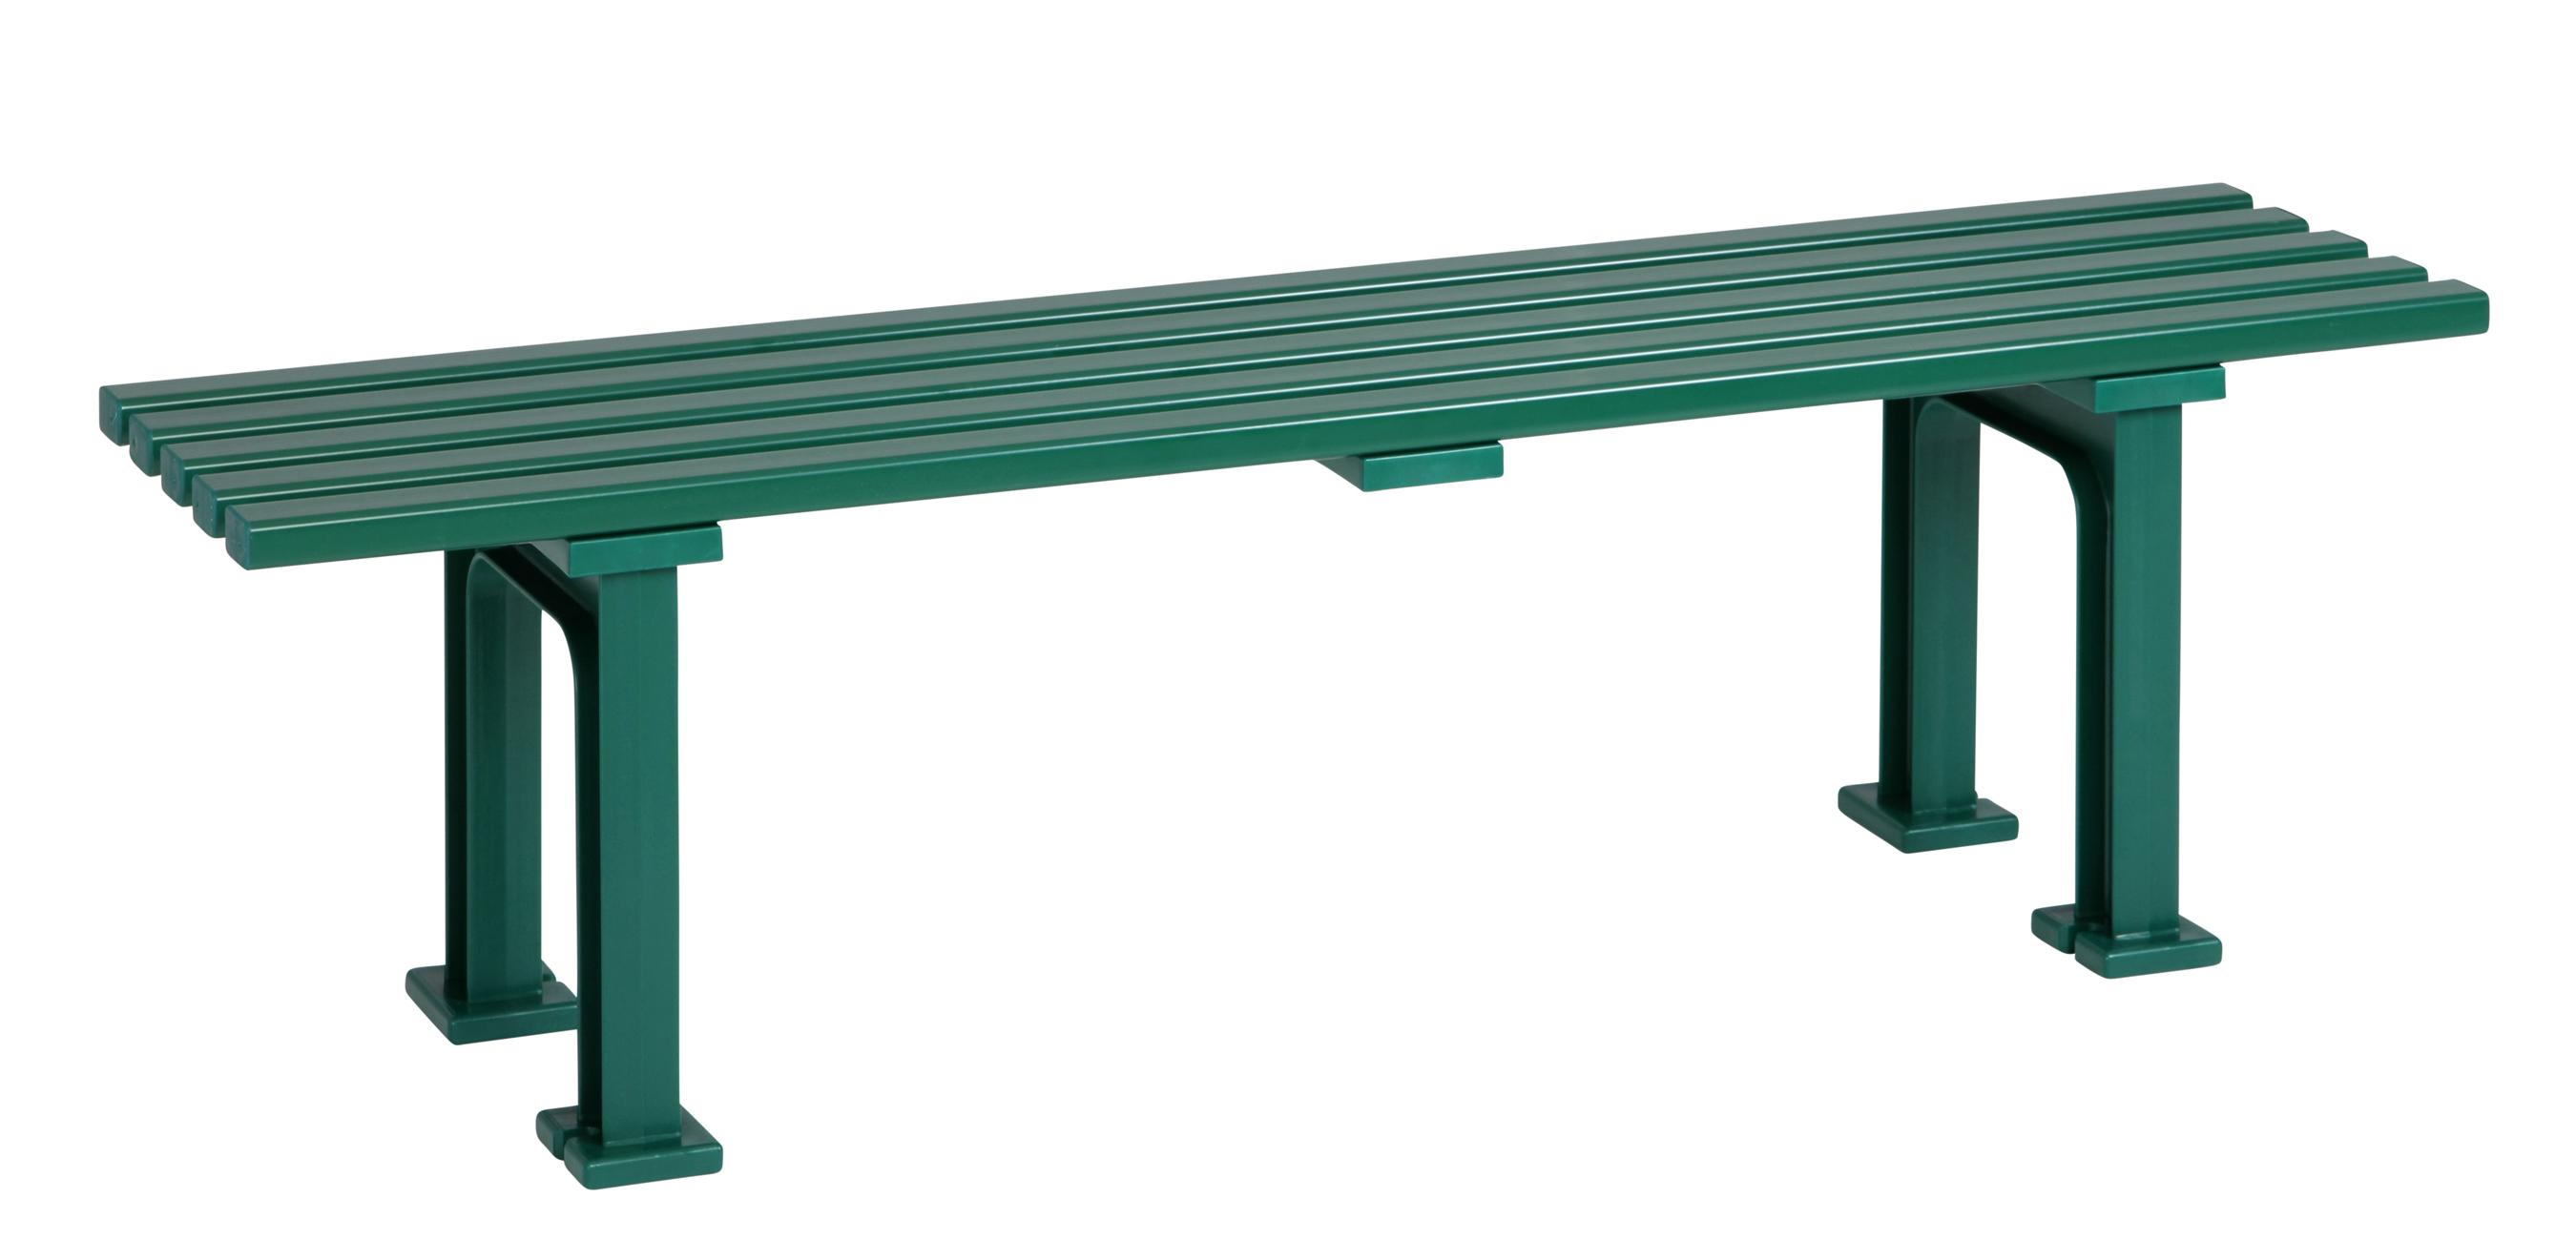 Blome Gartenbank / 3-Sitzer Bank Mono I Kunststoff grün 150cm Bild 1